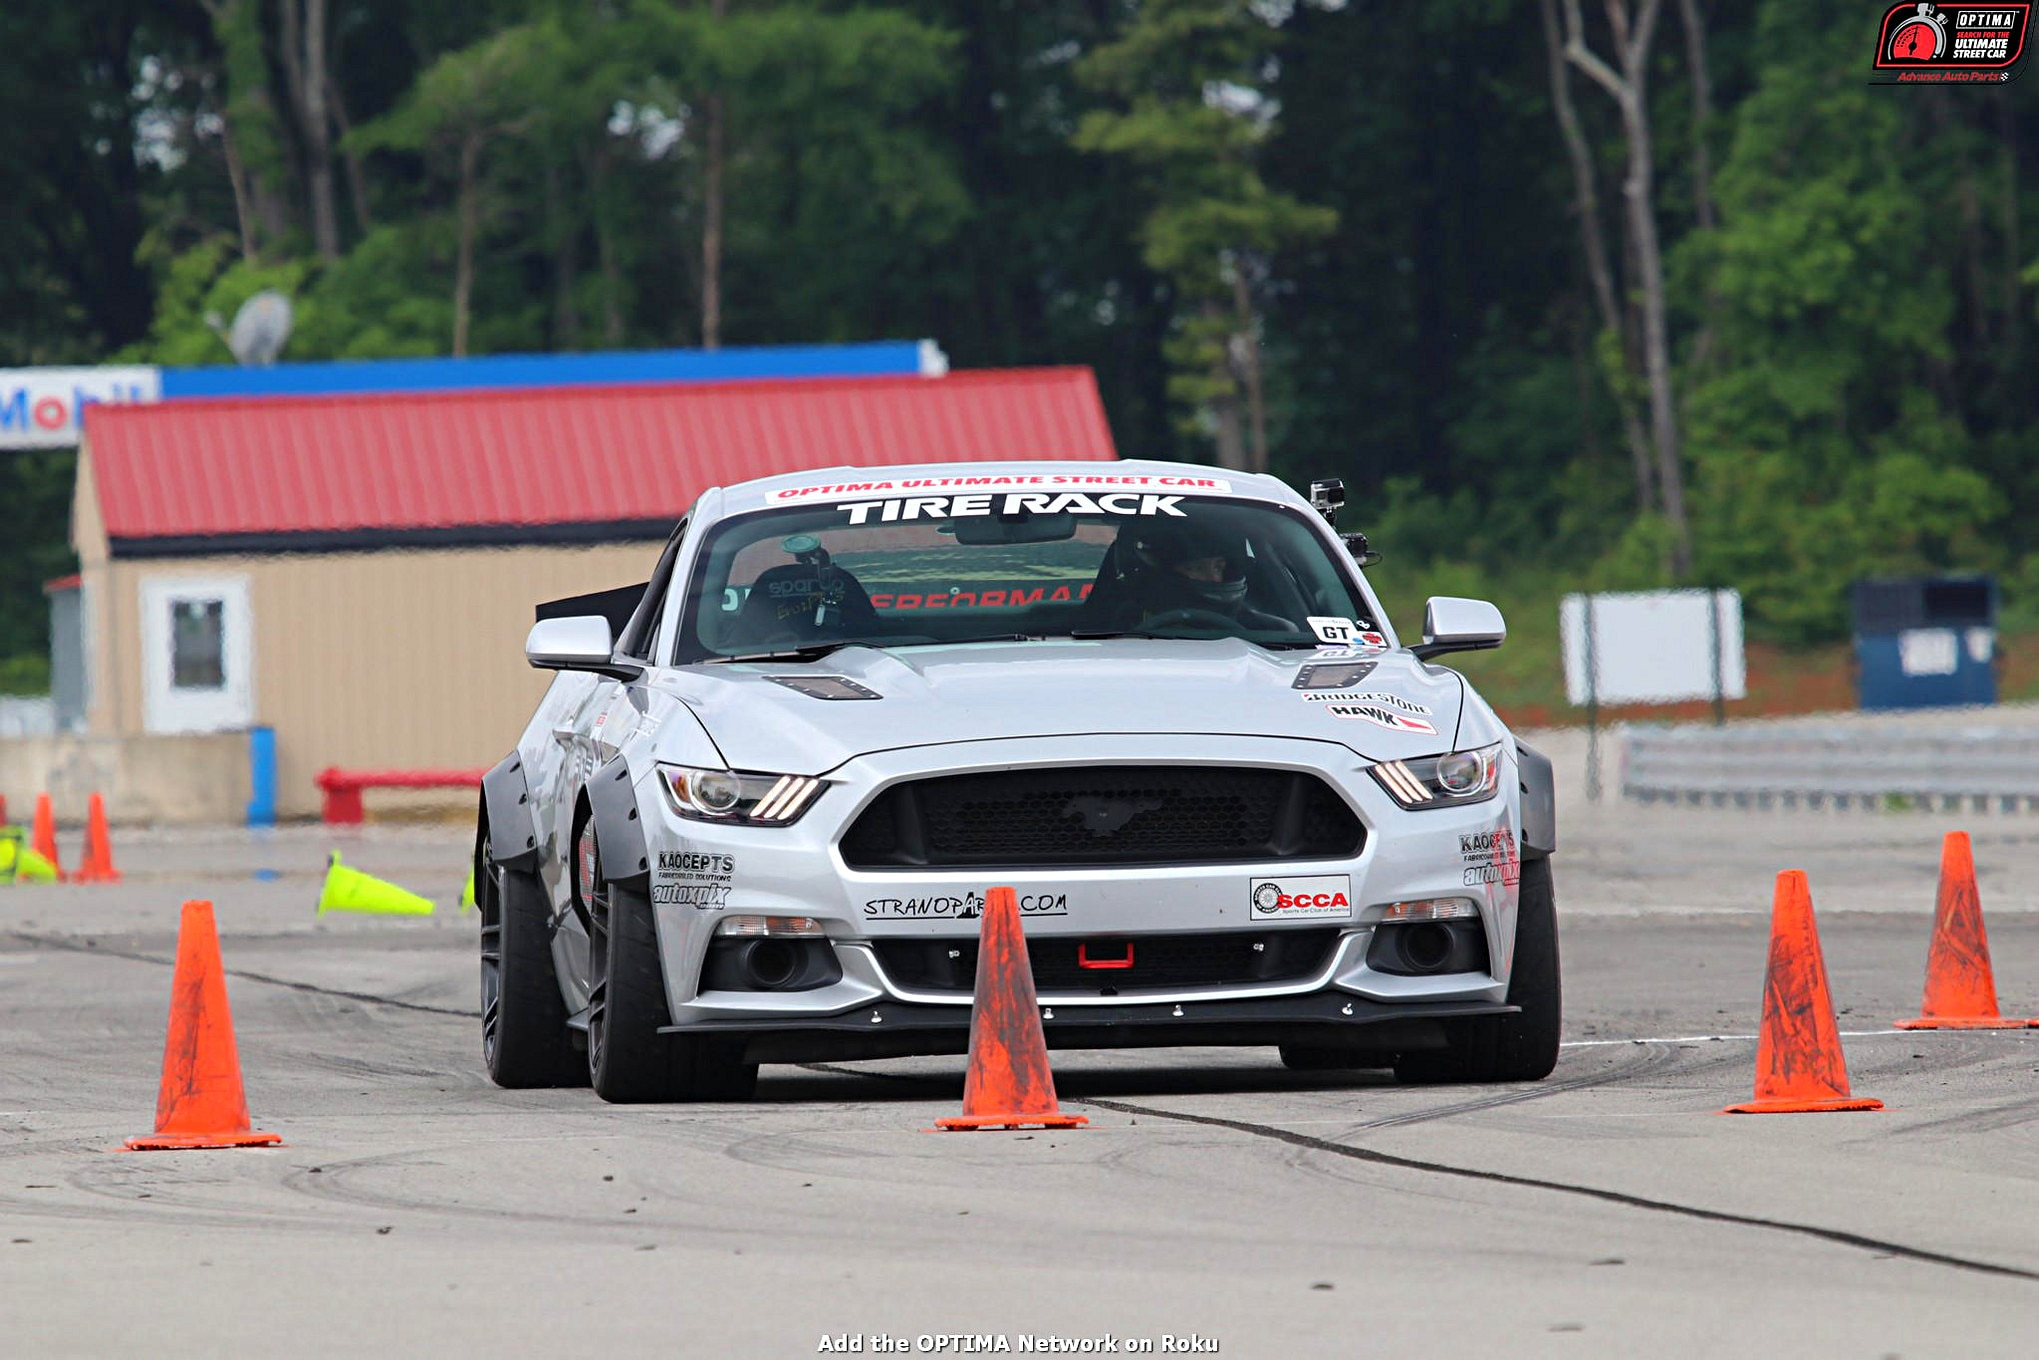 MMFF John Laughlin 2016 Ford Mustang DriveOPTIMA NCM Motorsports Park 2018 155 008